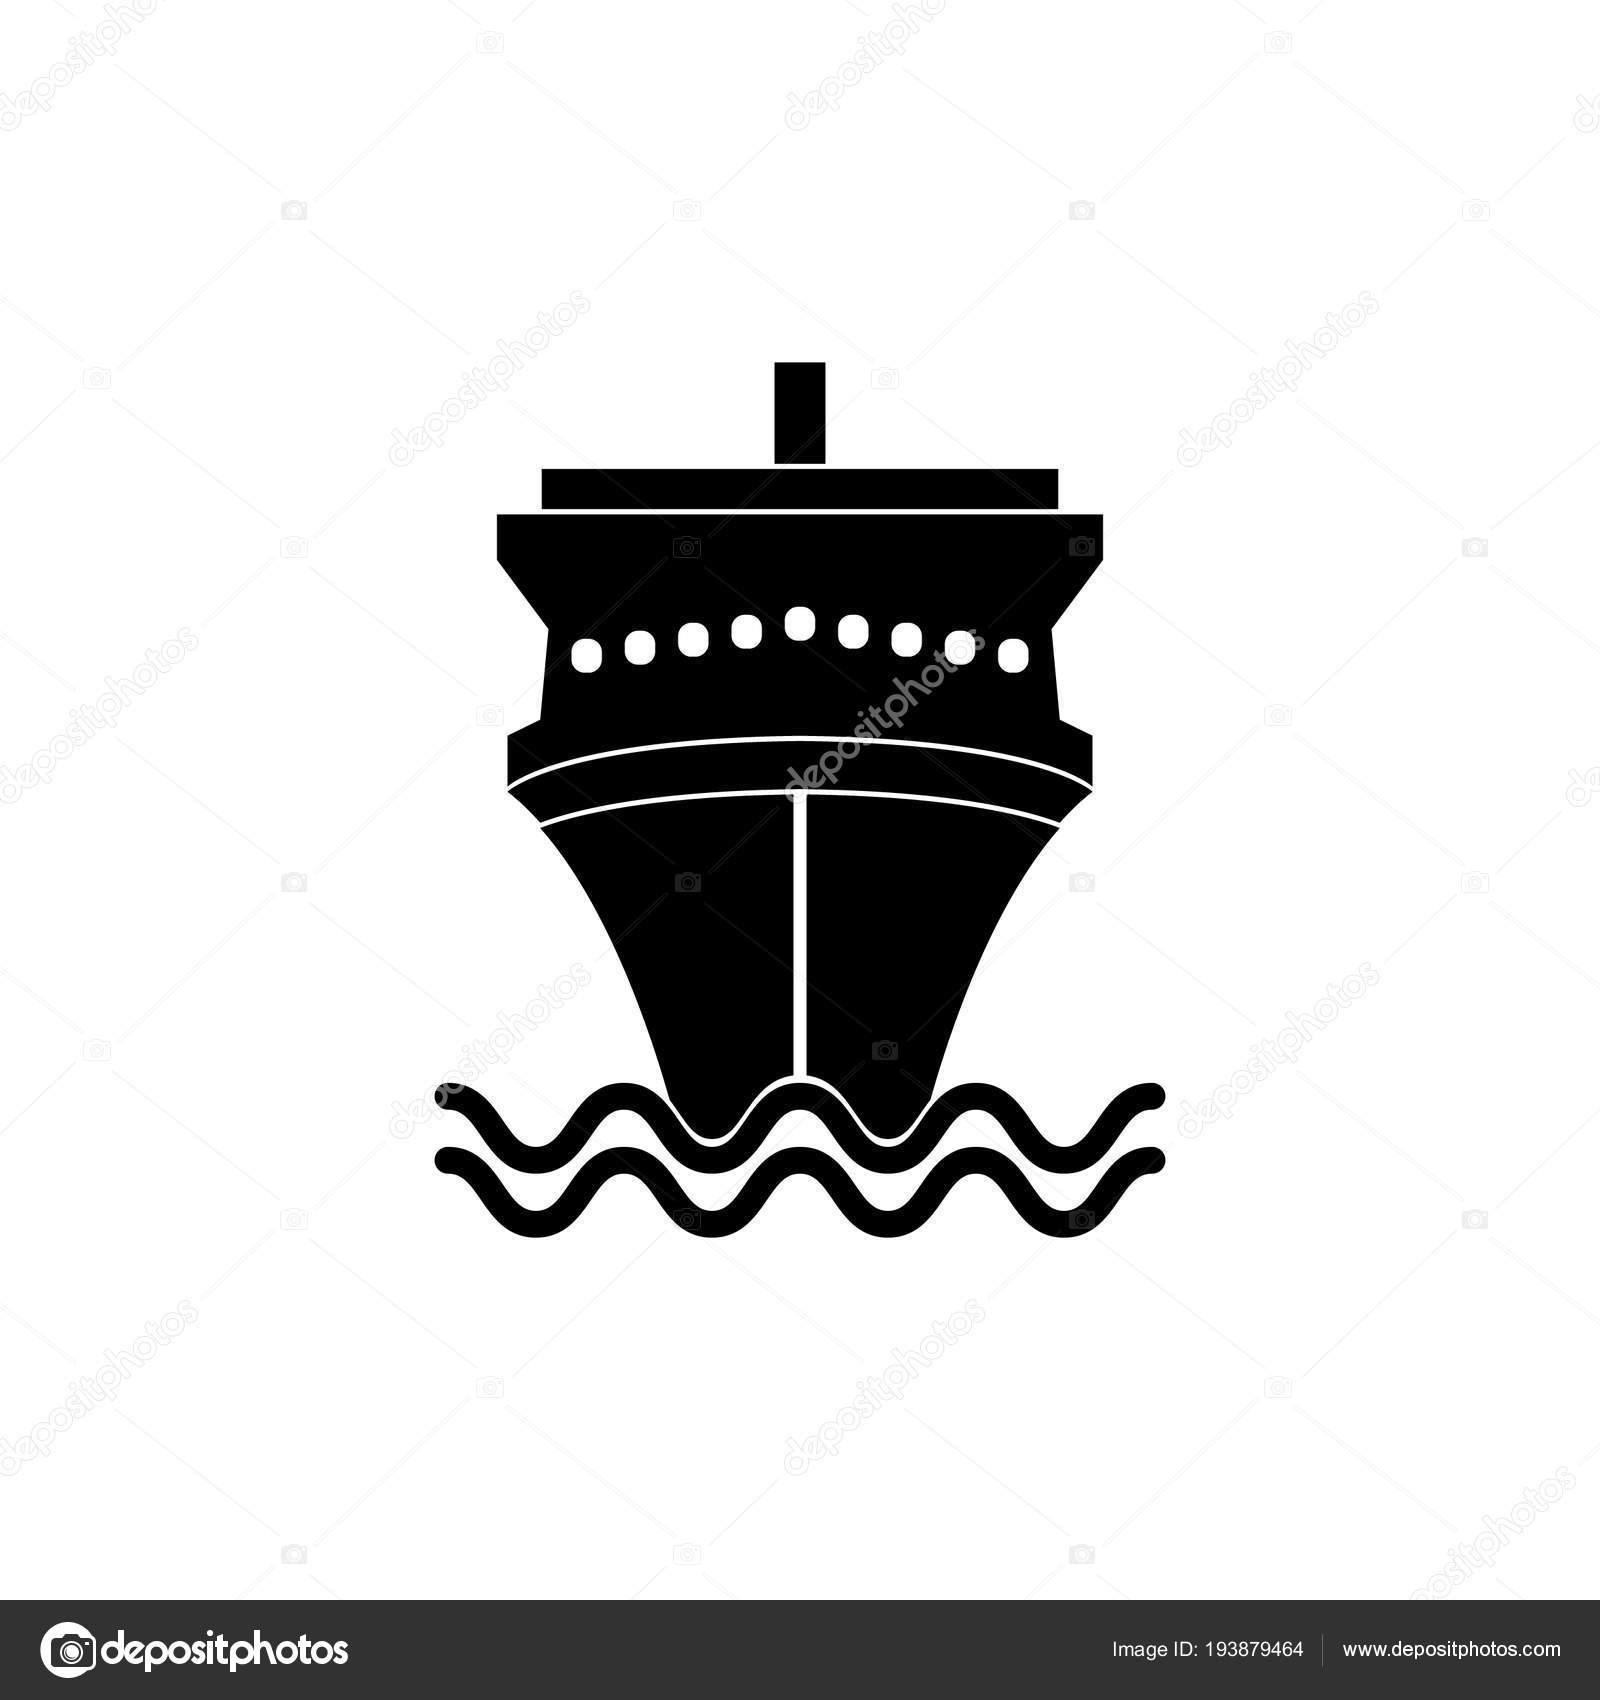 Gemi Simgesi Basit Vektör çizim Stok Vektör счастье 193879464